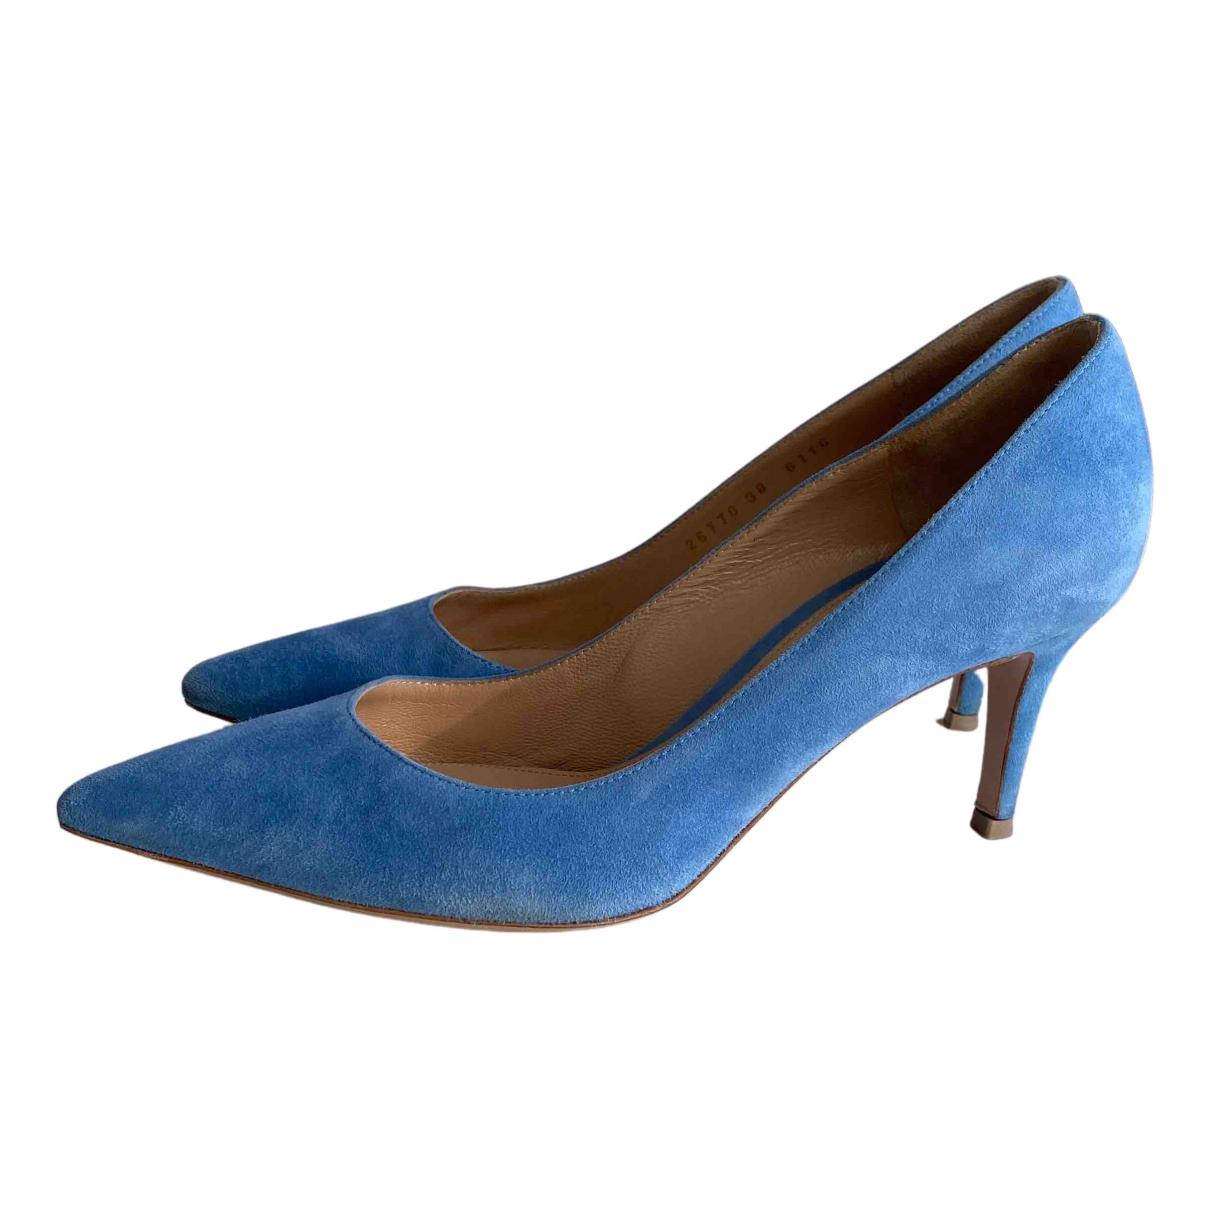 Gianvito Rossi Gianvito Blue Suede Heels for Women 38 EU